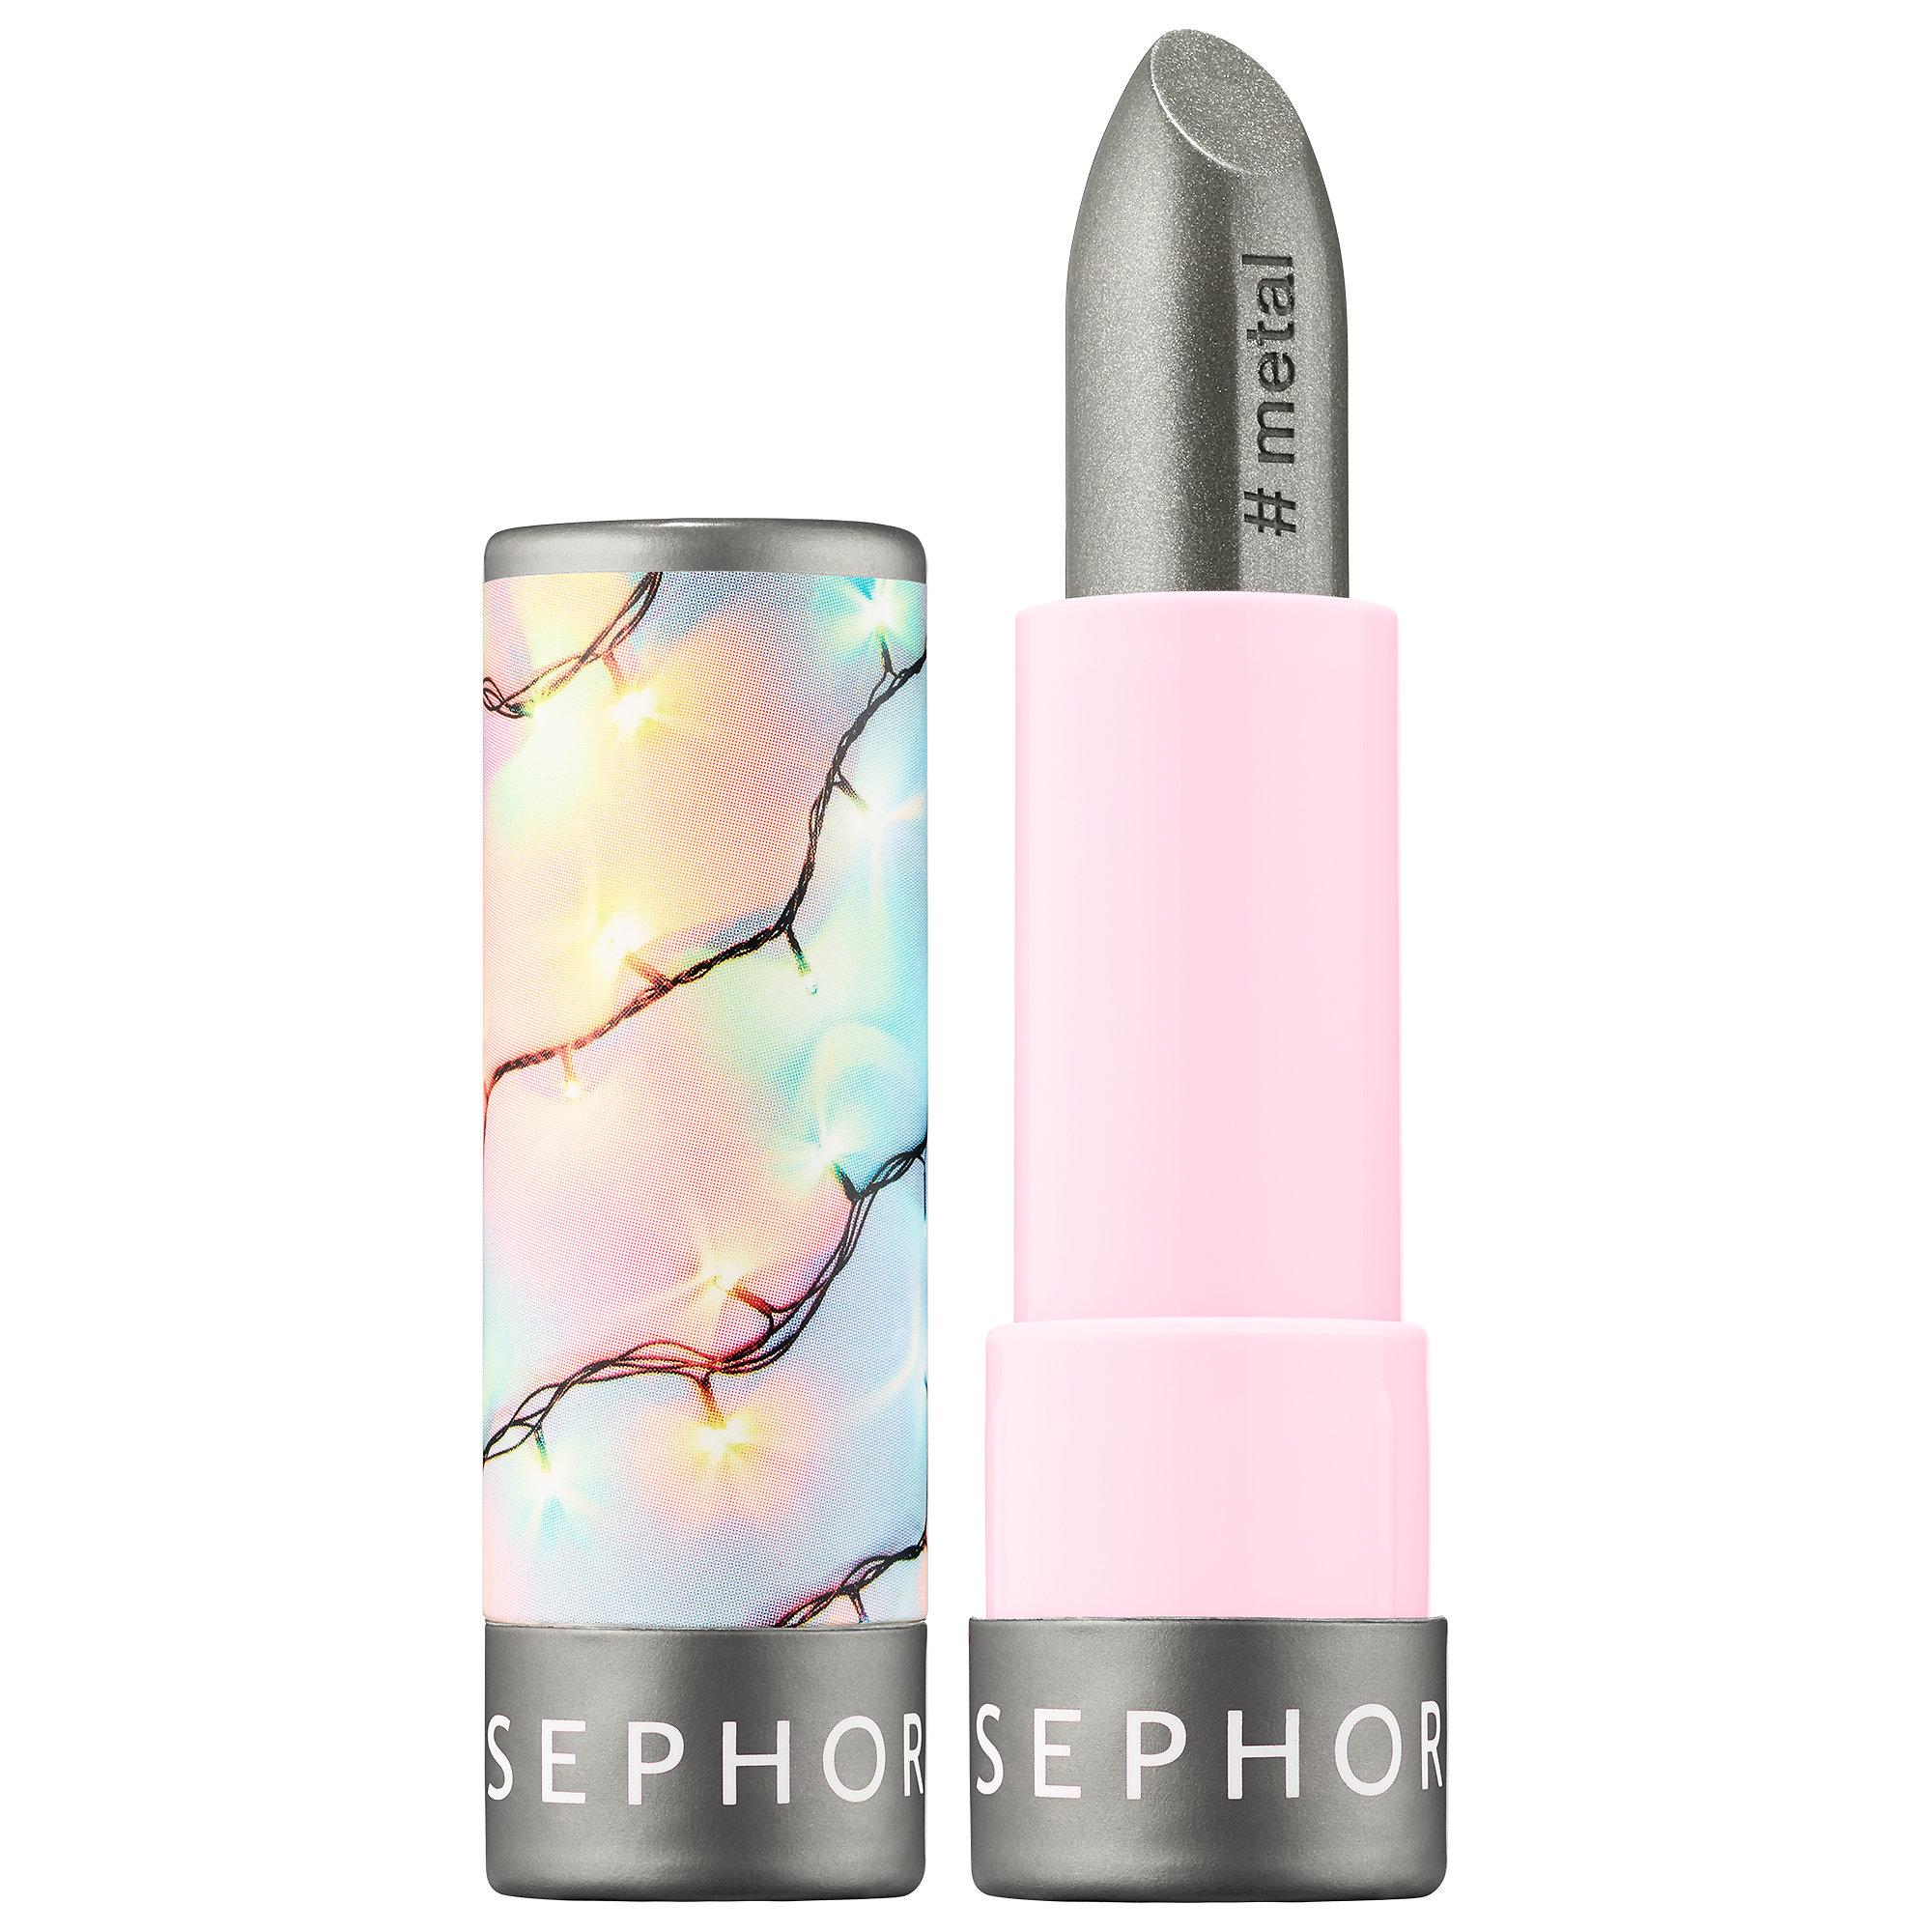 S     ephora Collection   #LipStories Lipstick